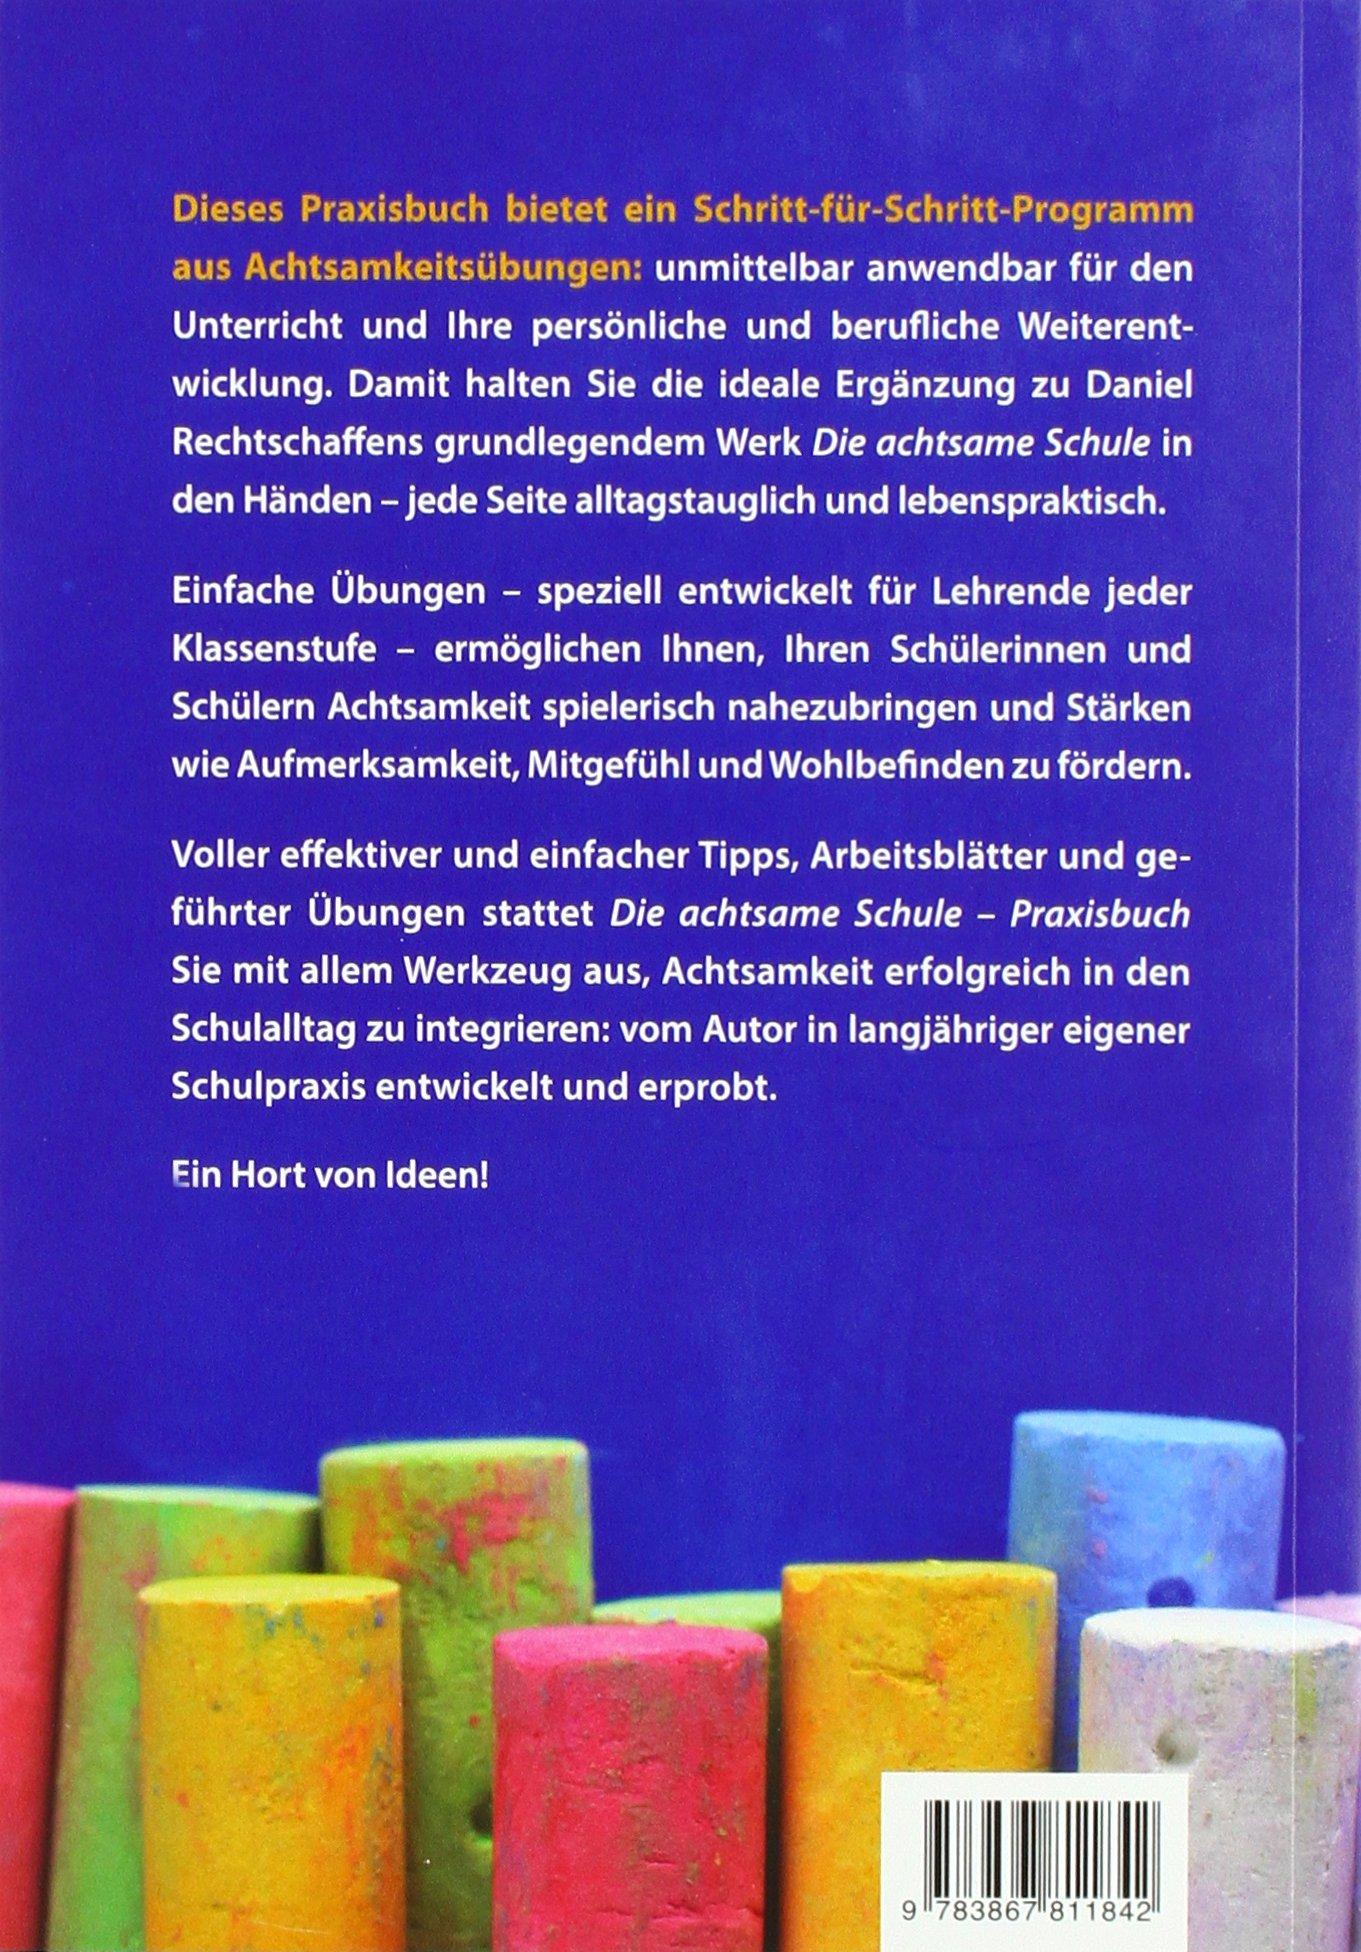 Old Fashioned Einfache Kindergärten Arbeitsblatt Image ...